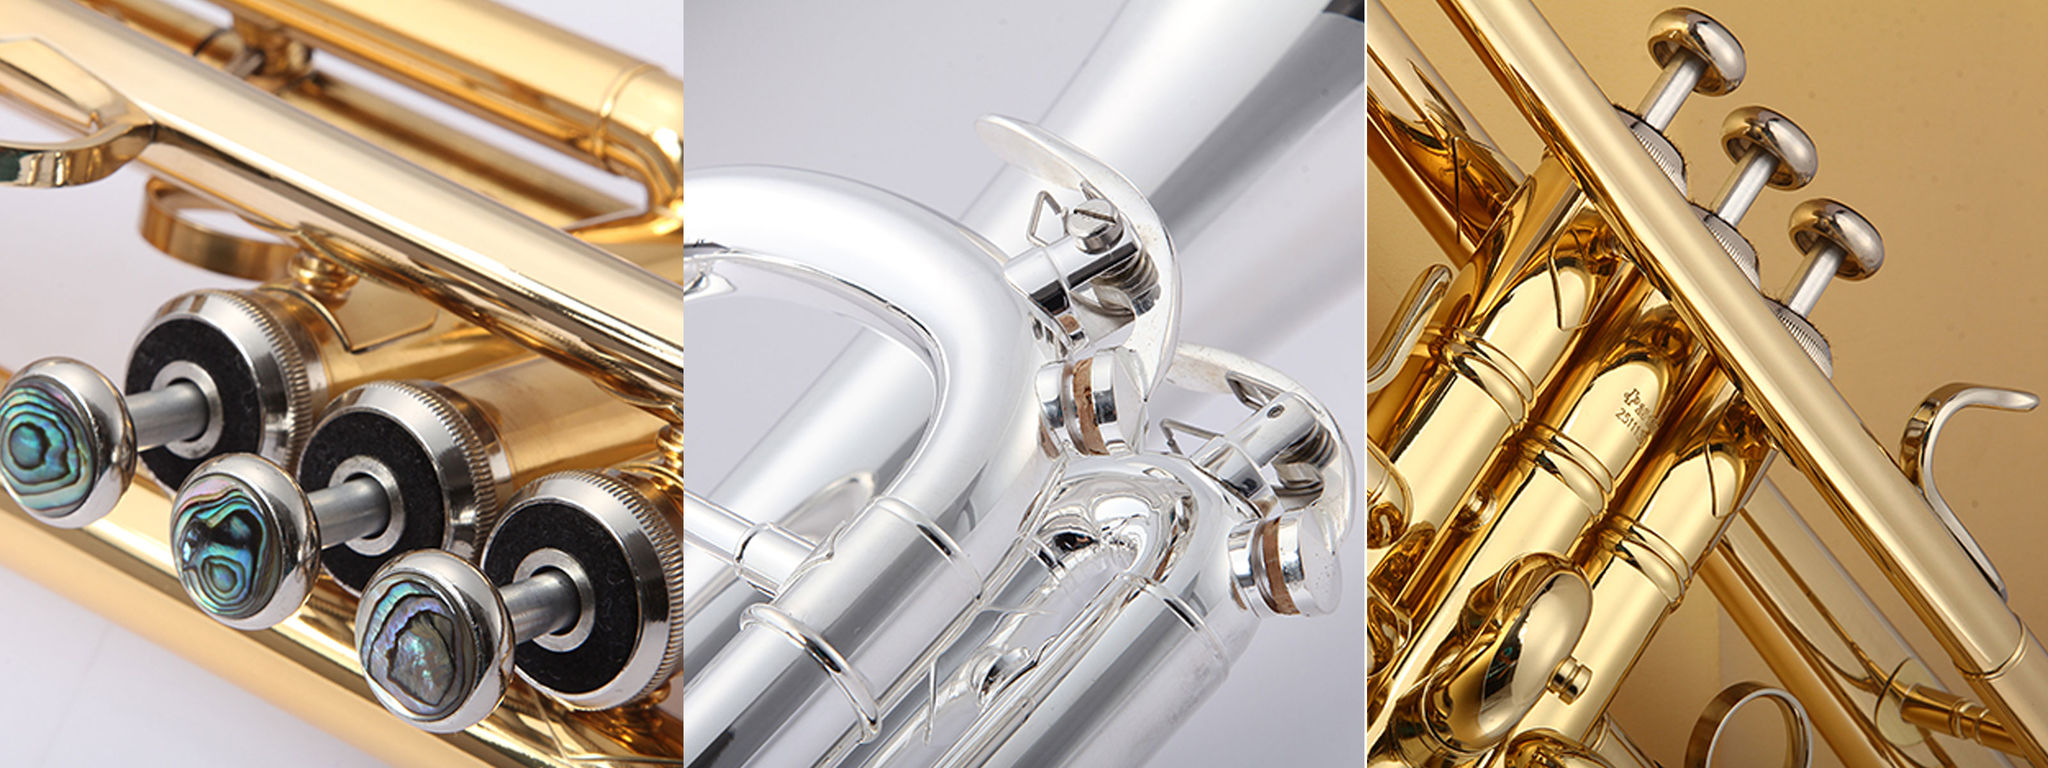 JP251SW Trumpet